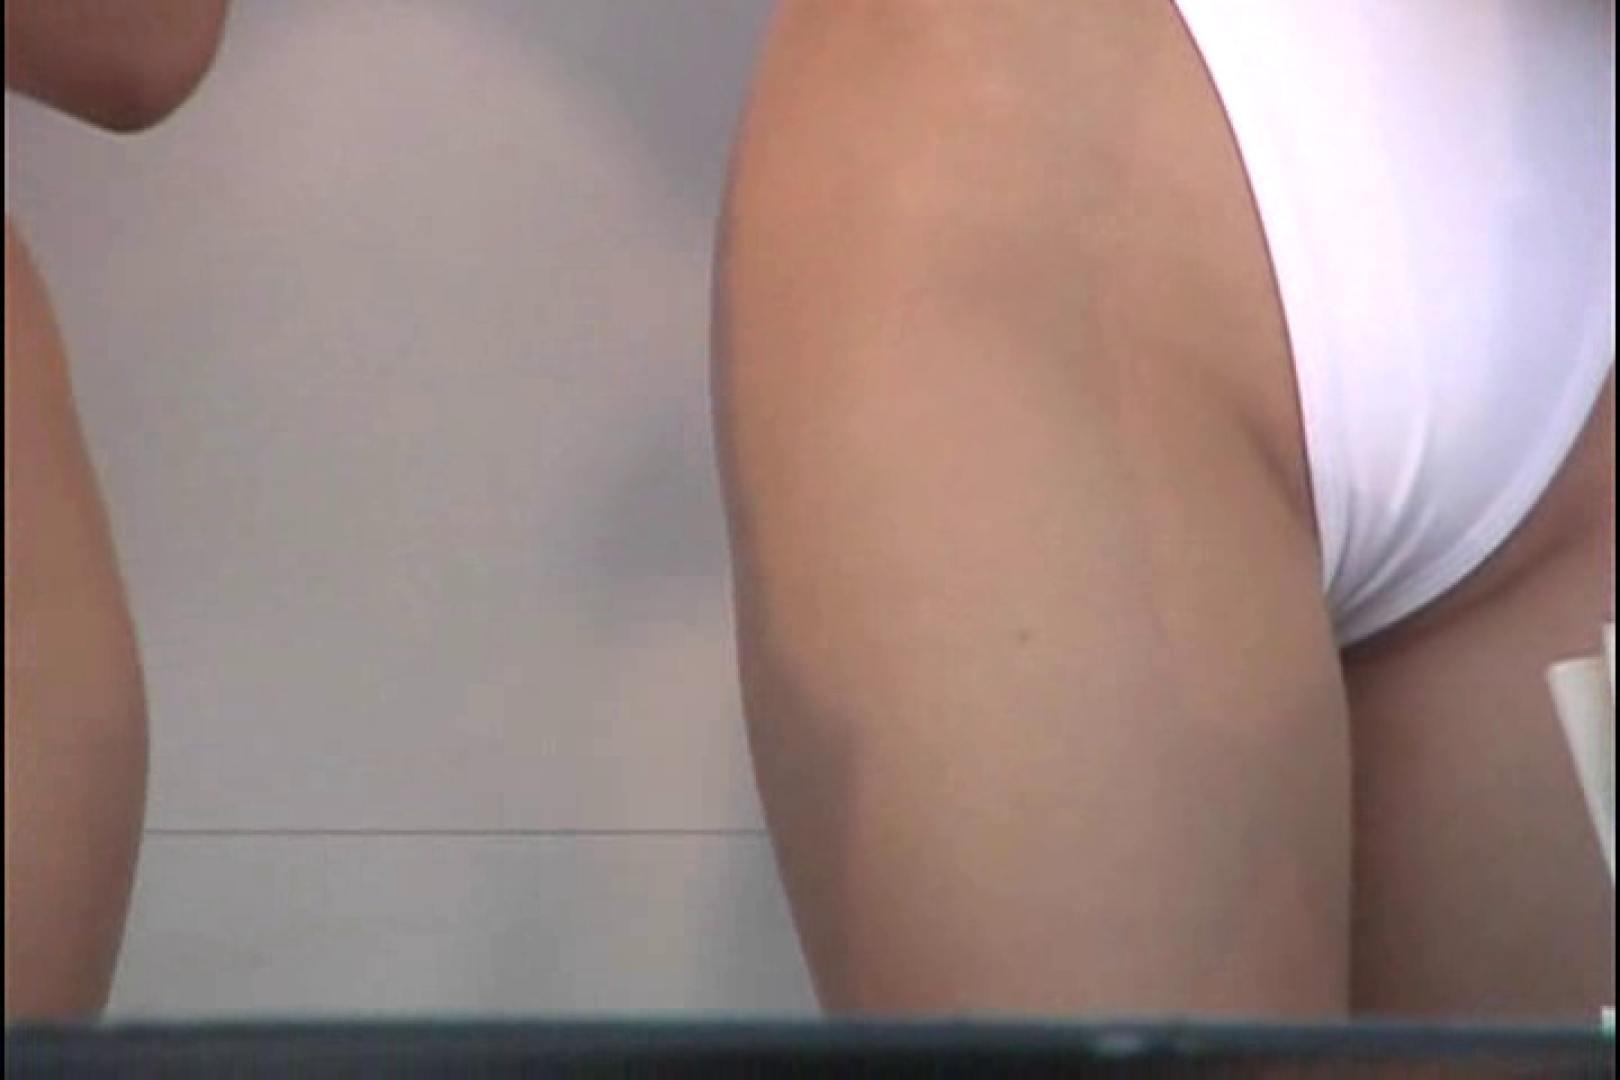 RQカメラ地獄Vol.10 乳首ポロリ 盗撮戯れ無修正画像 68画像 54